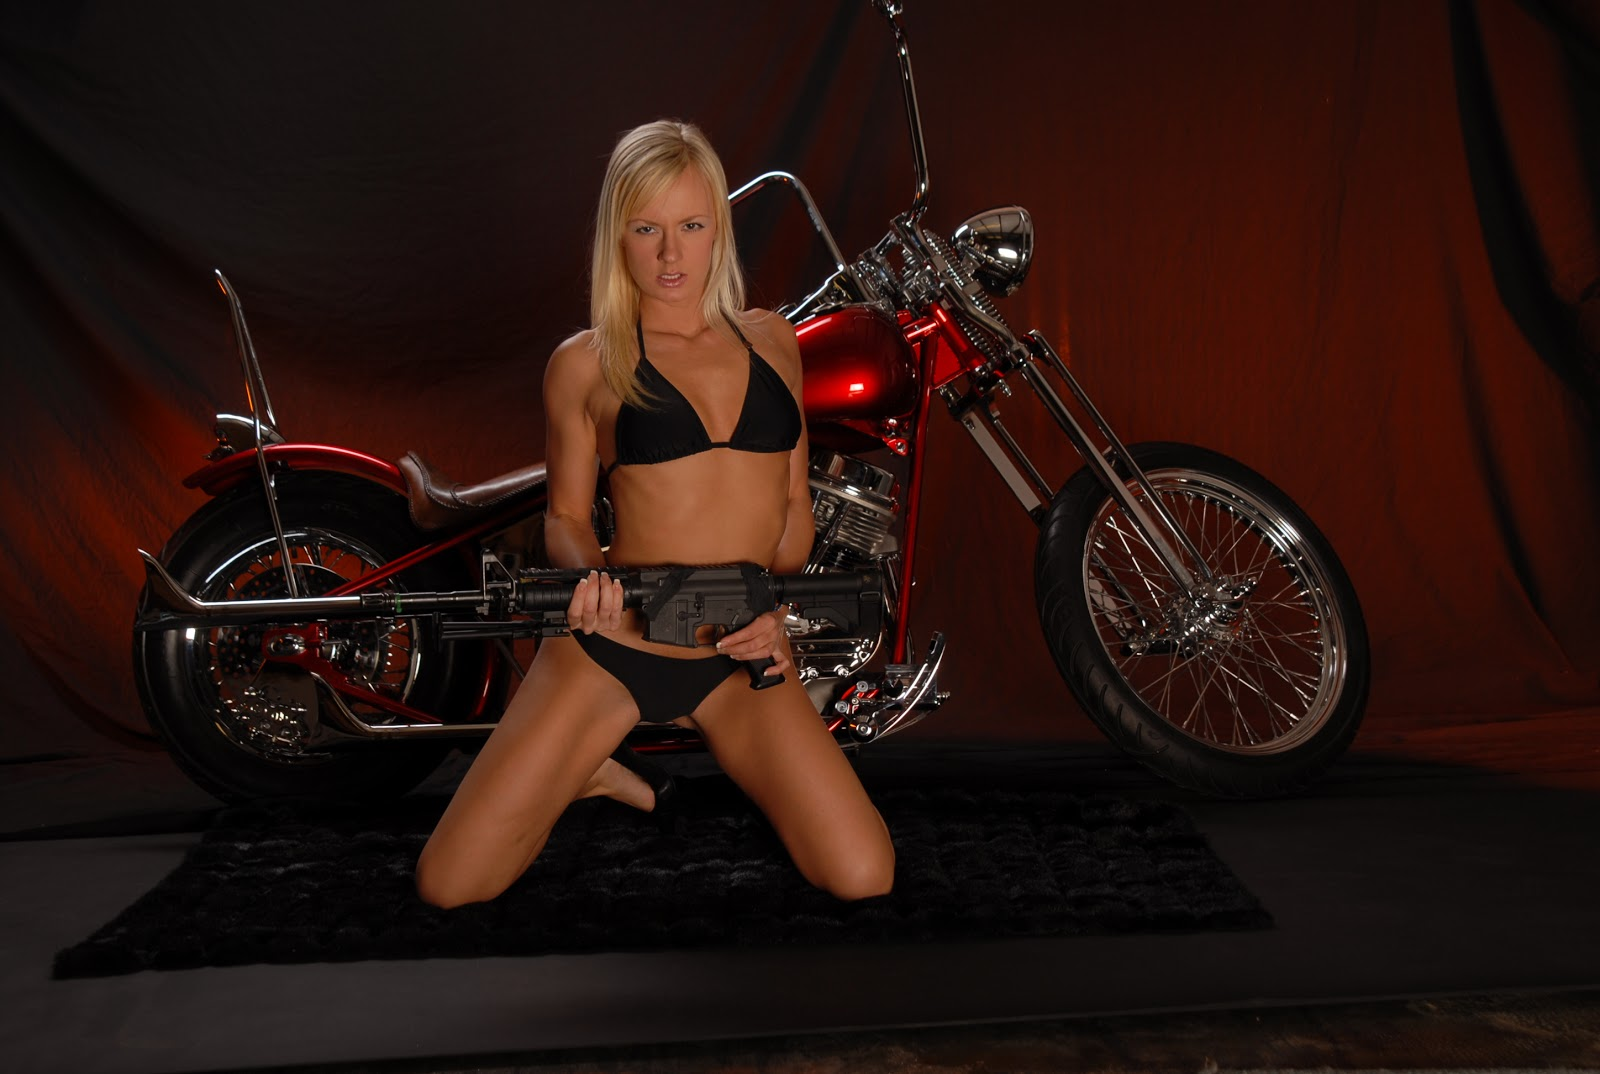 http://4.bp.blogspot.com/-14OKpZF02os/UHnHYZlGlwI/AAAAAAAAFts/g_KbLXxYt7U/s1600/bikini_guns_motorbikes_desktop_2896x1944_hd-wallpaper-846049.jpeg